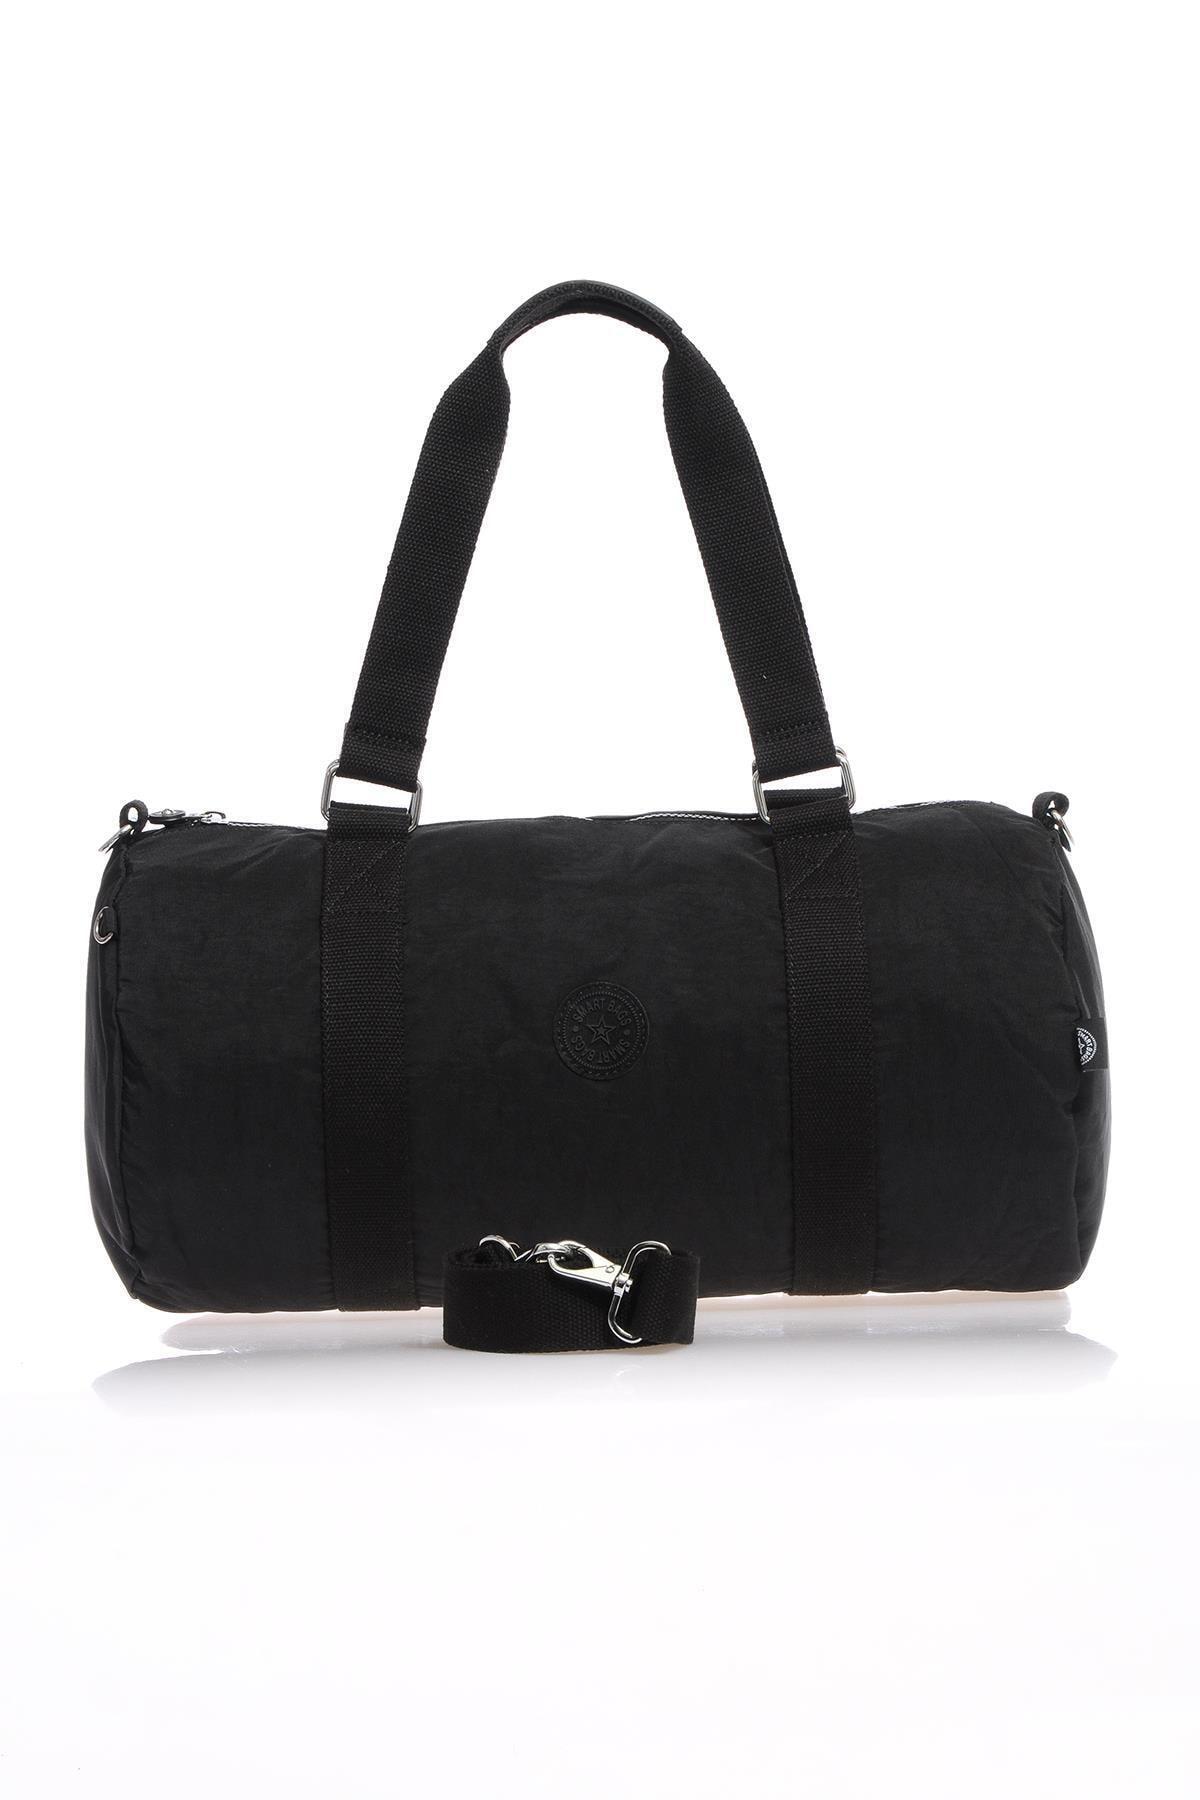 SMART BAGS Smb1245-0001 Siyah Kadın Spor Çantası 1